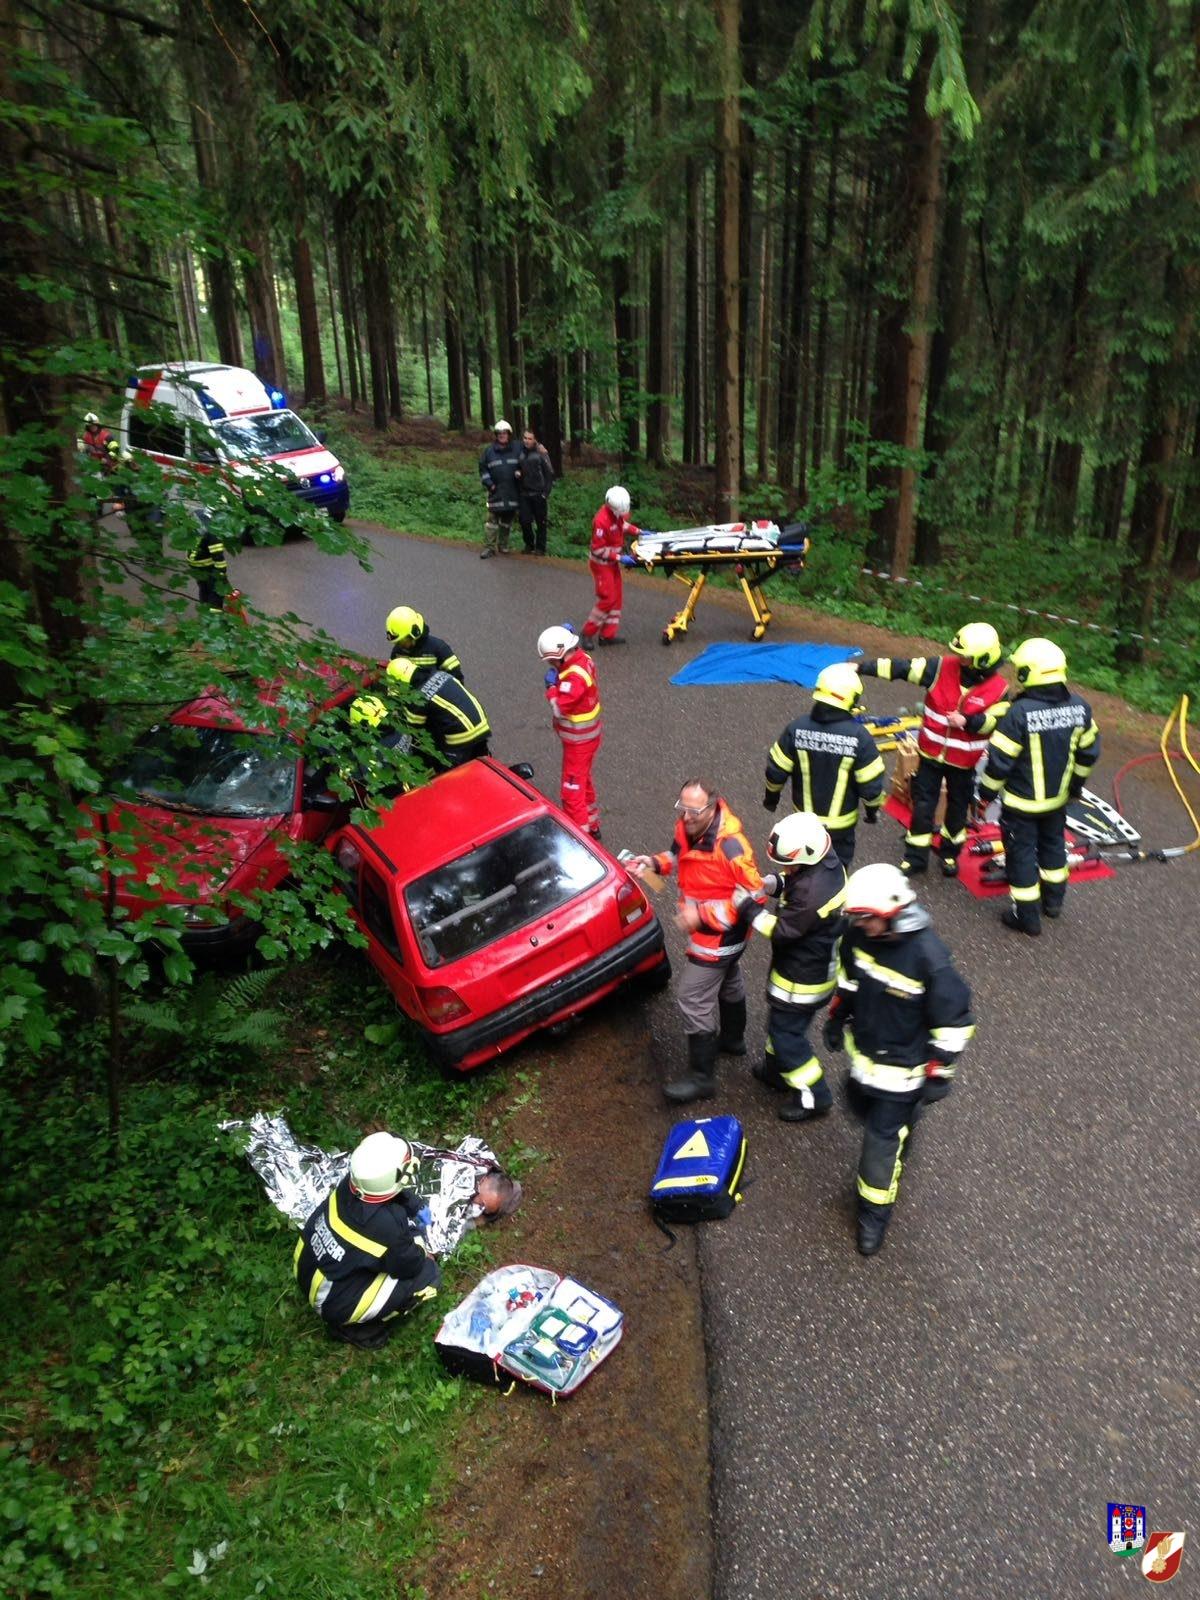 Übung: Verkehrsunfall mit mehreren Verletzten